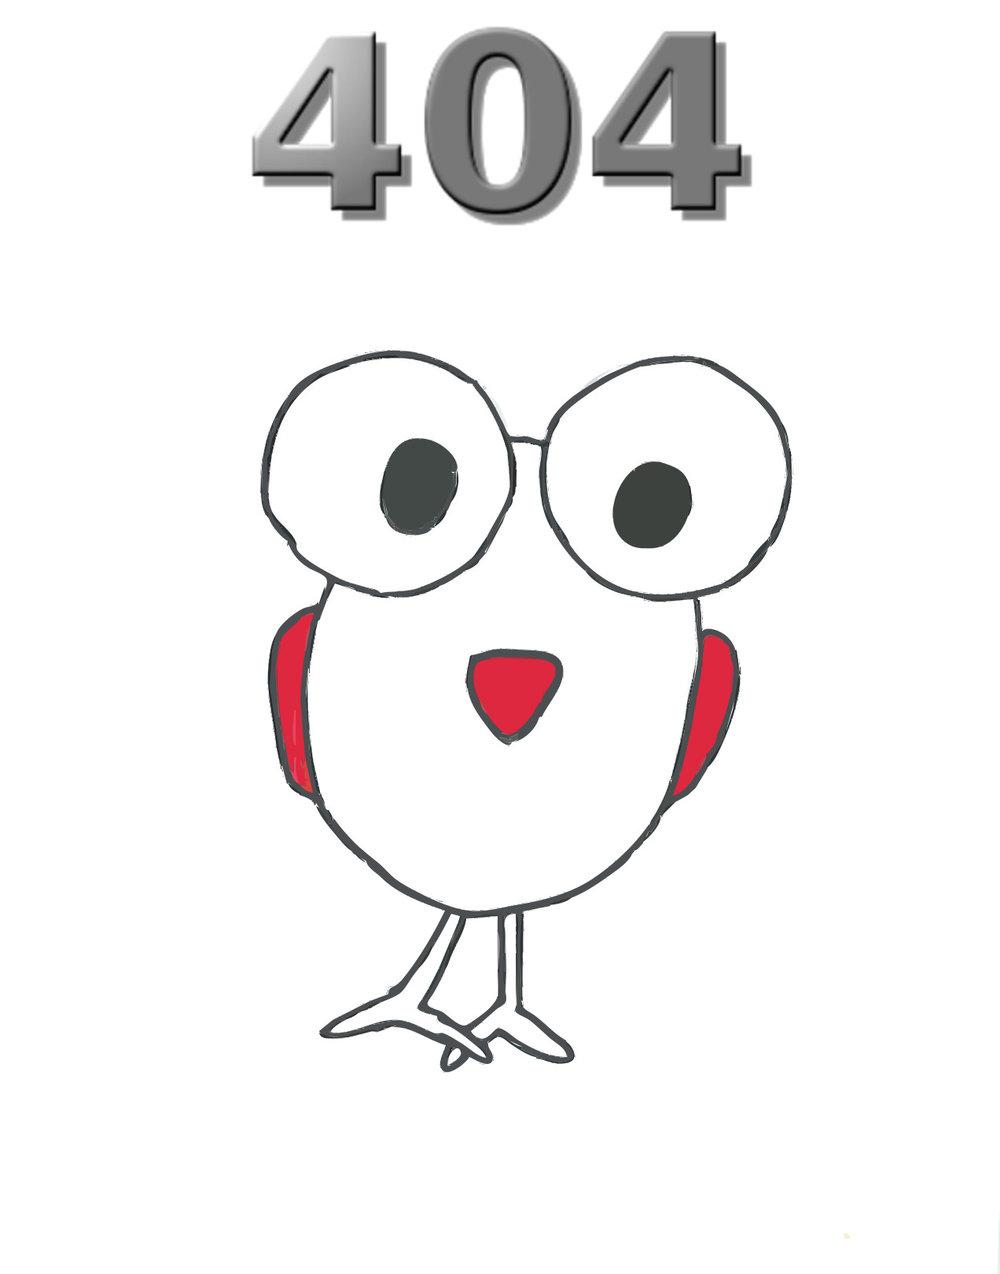 Big-Eyed-Bird-404 composite.jpg